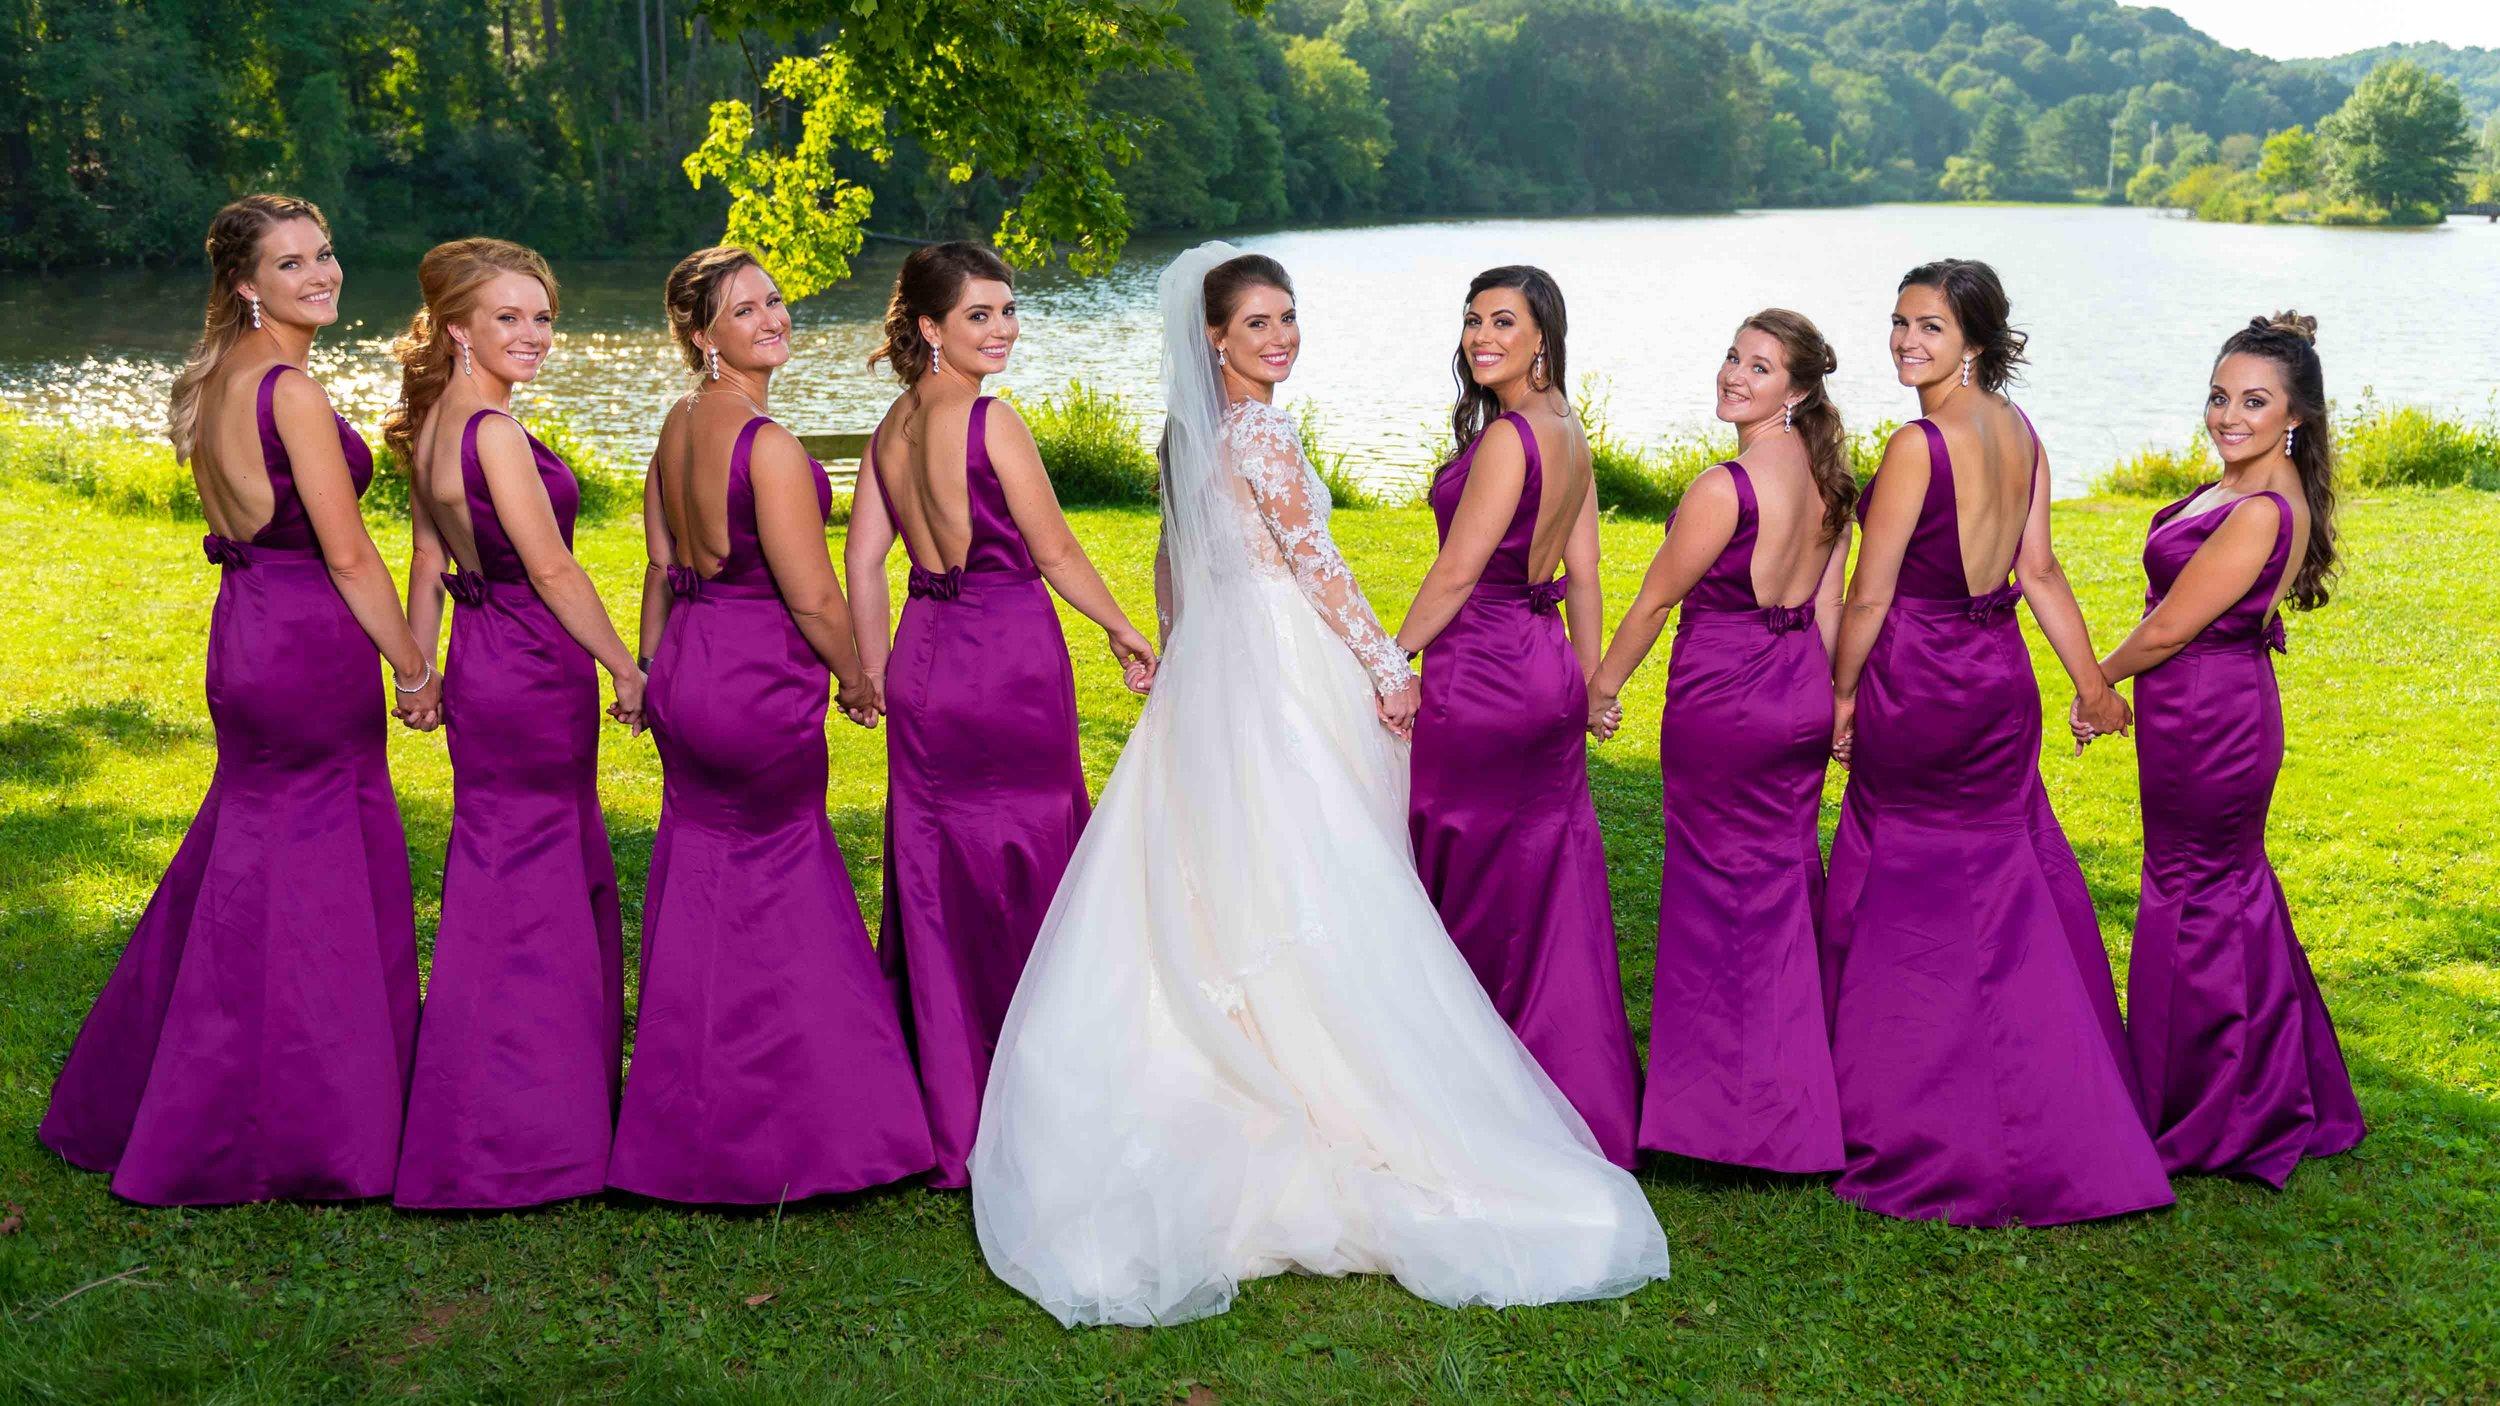 Wedding-North-Park-Bridal-Party-Portraits-13.jpg